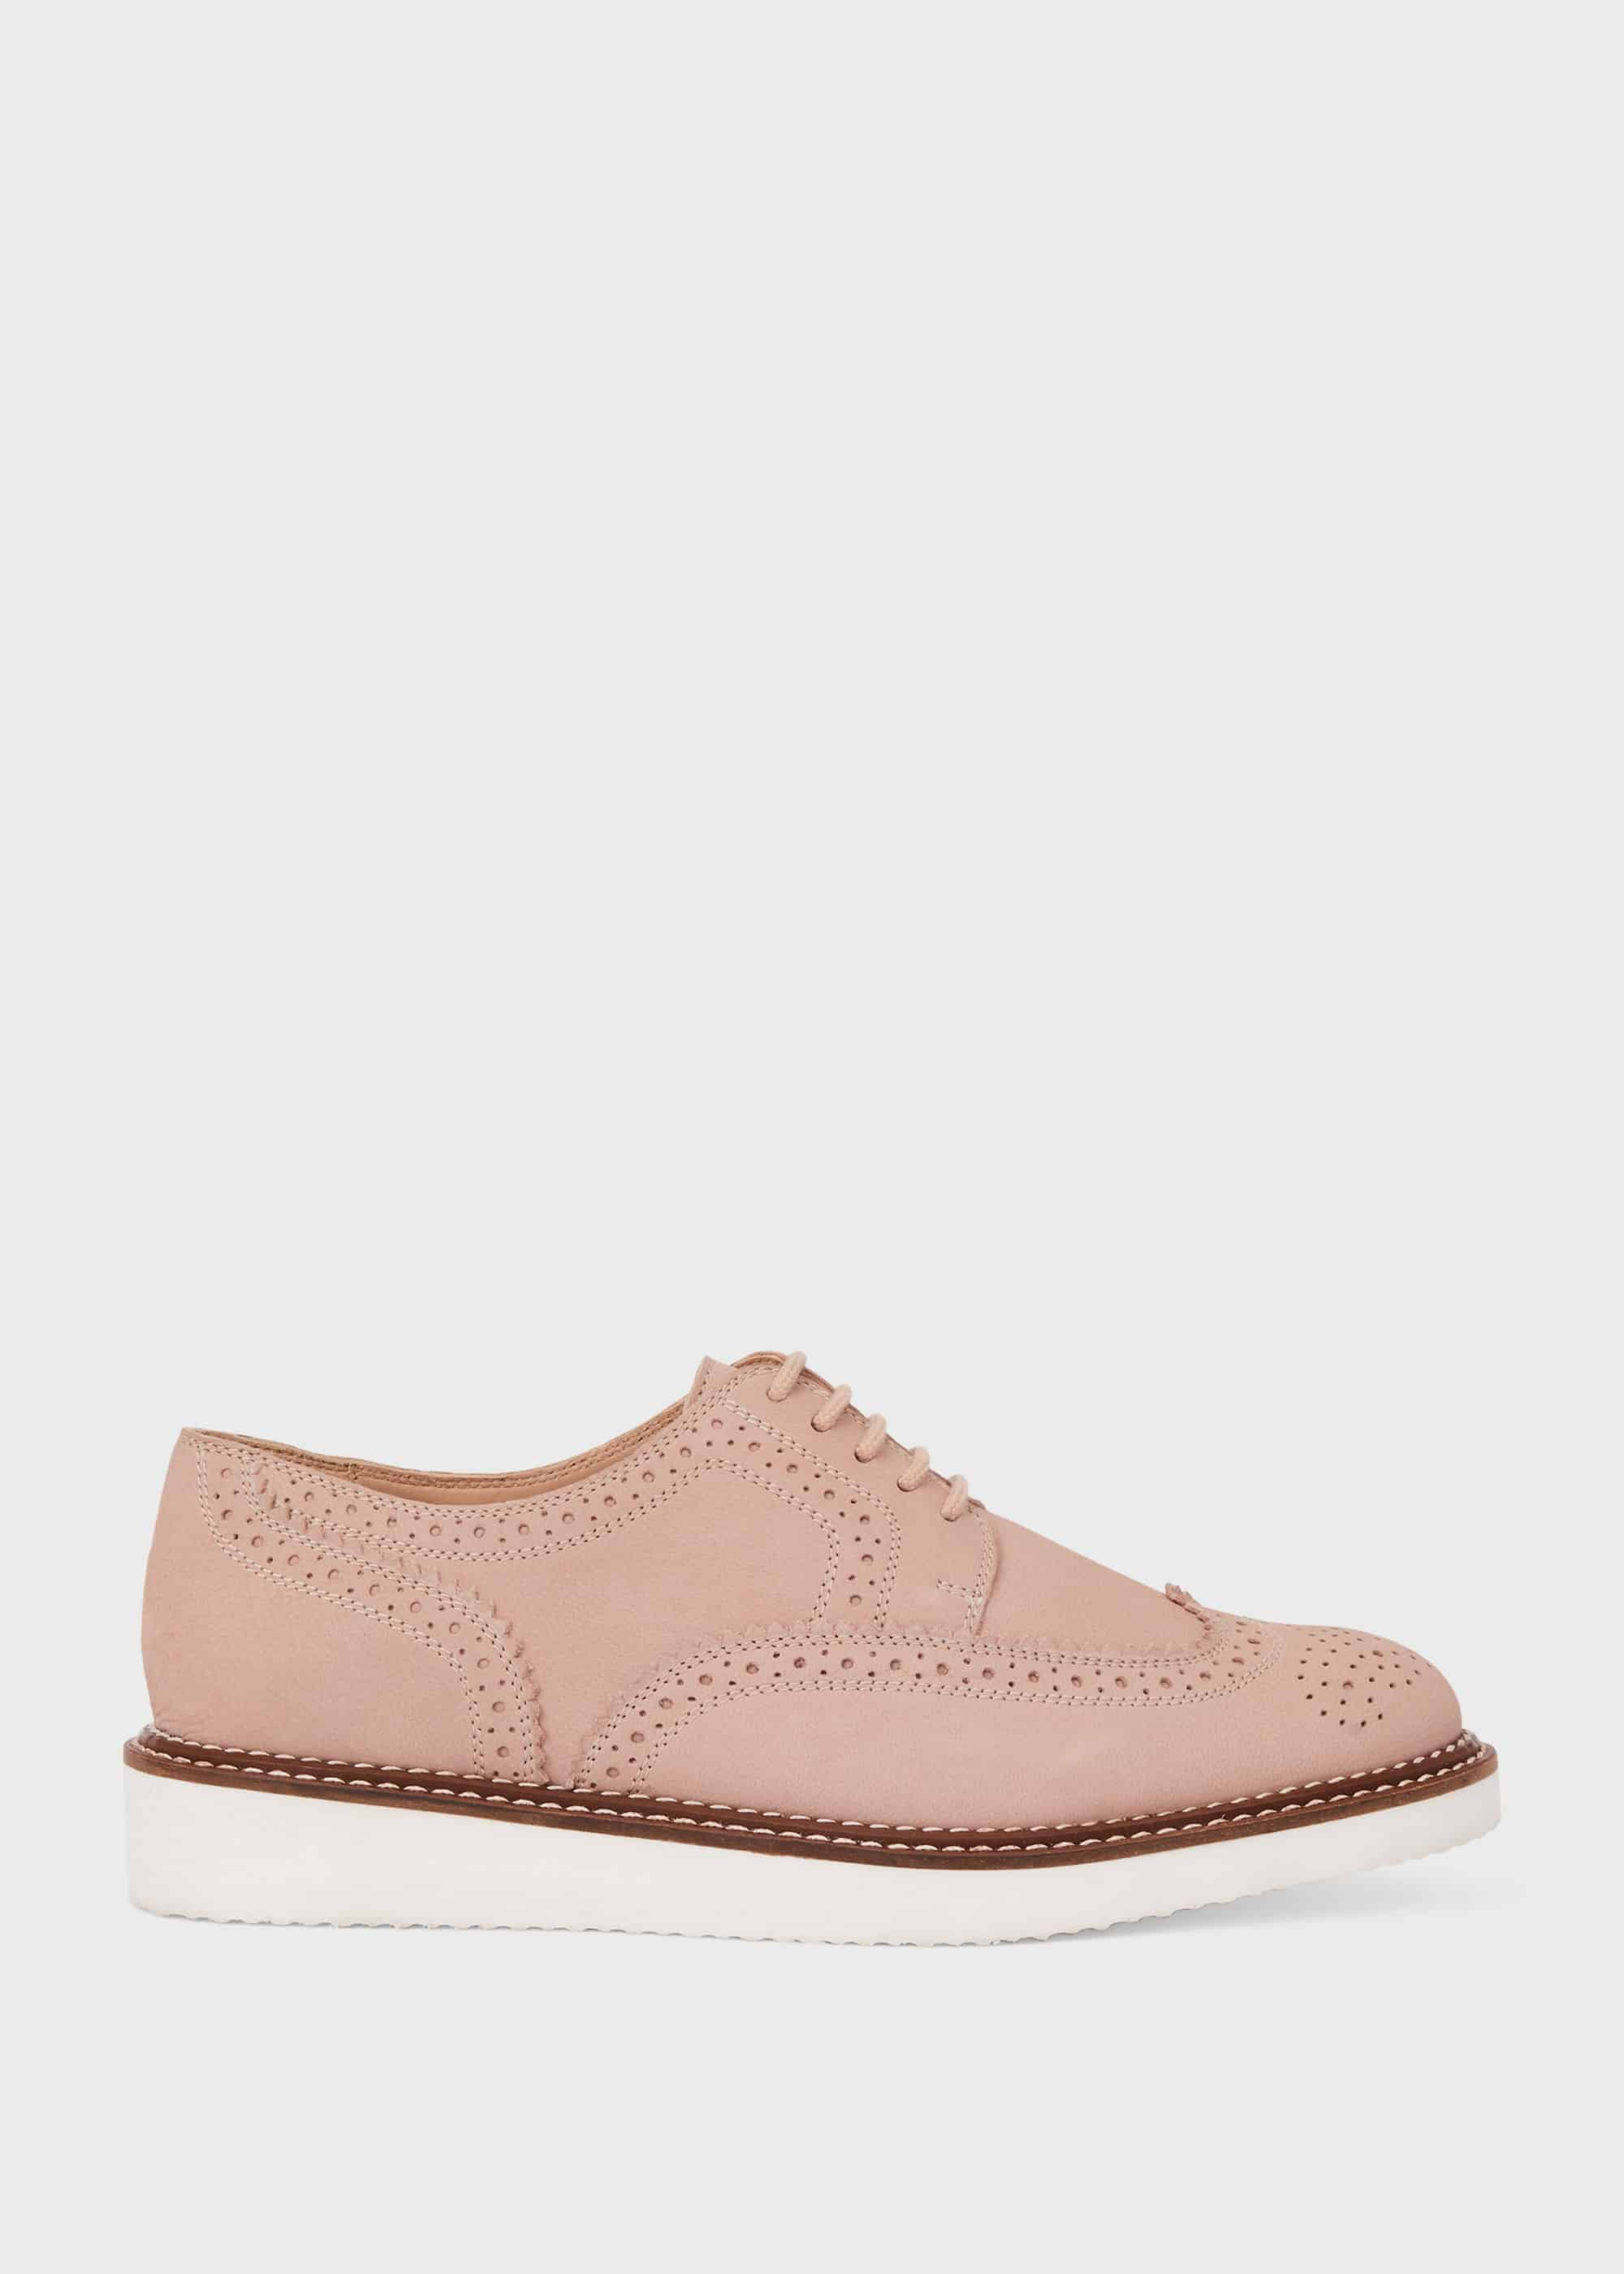 Hobbs Women Ottilie Leather Flatform Shoes